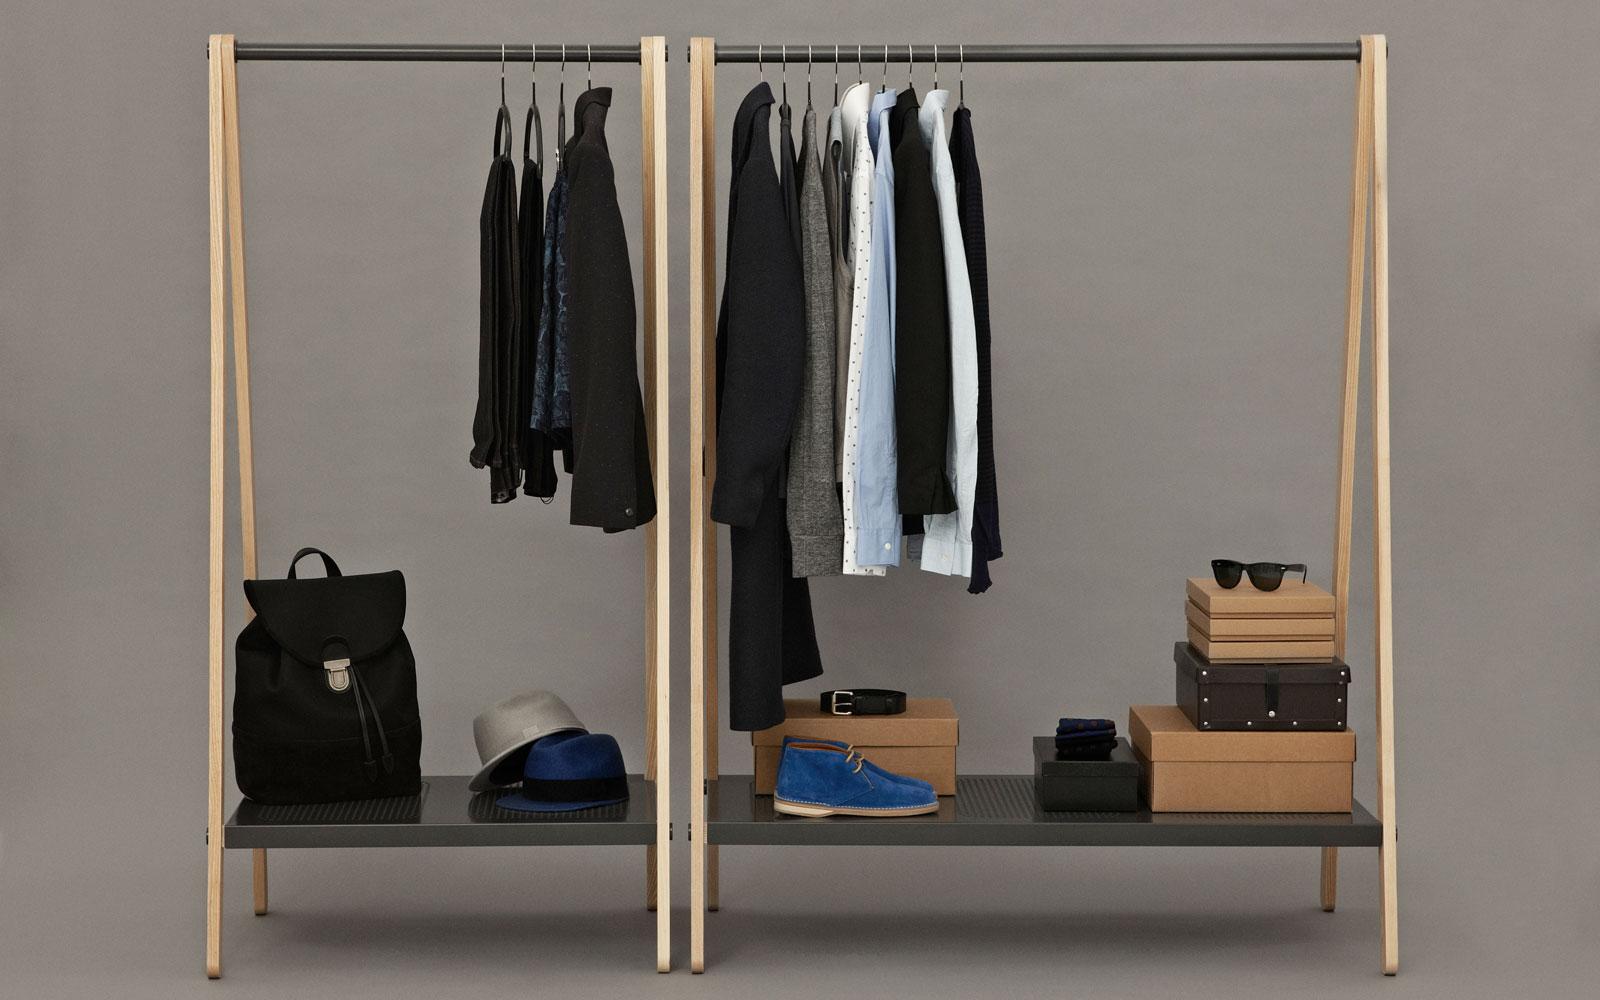 toj clothes rack stylish wardrobe furniture in grey steel and ash rh normann copenhagen com Closet Clothes Rack Clothing Shelves IKEA